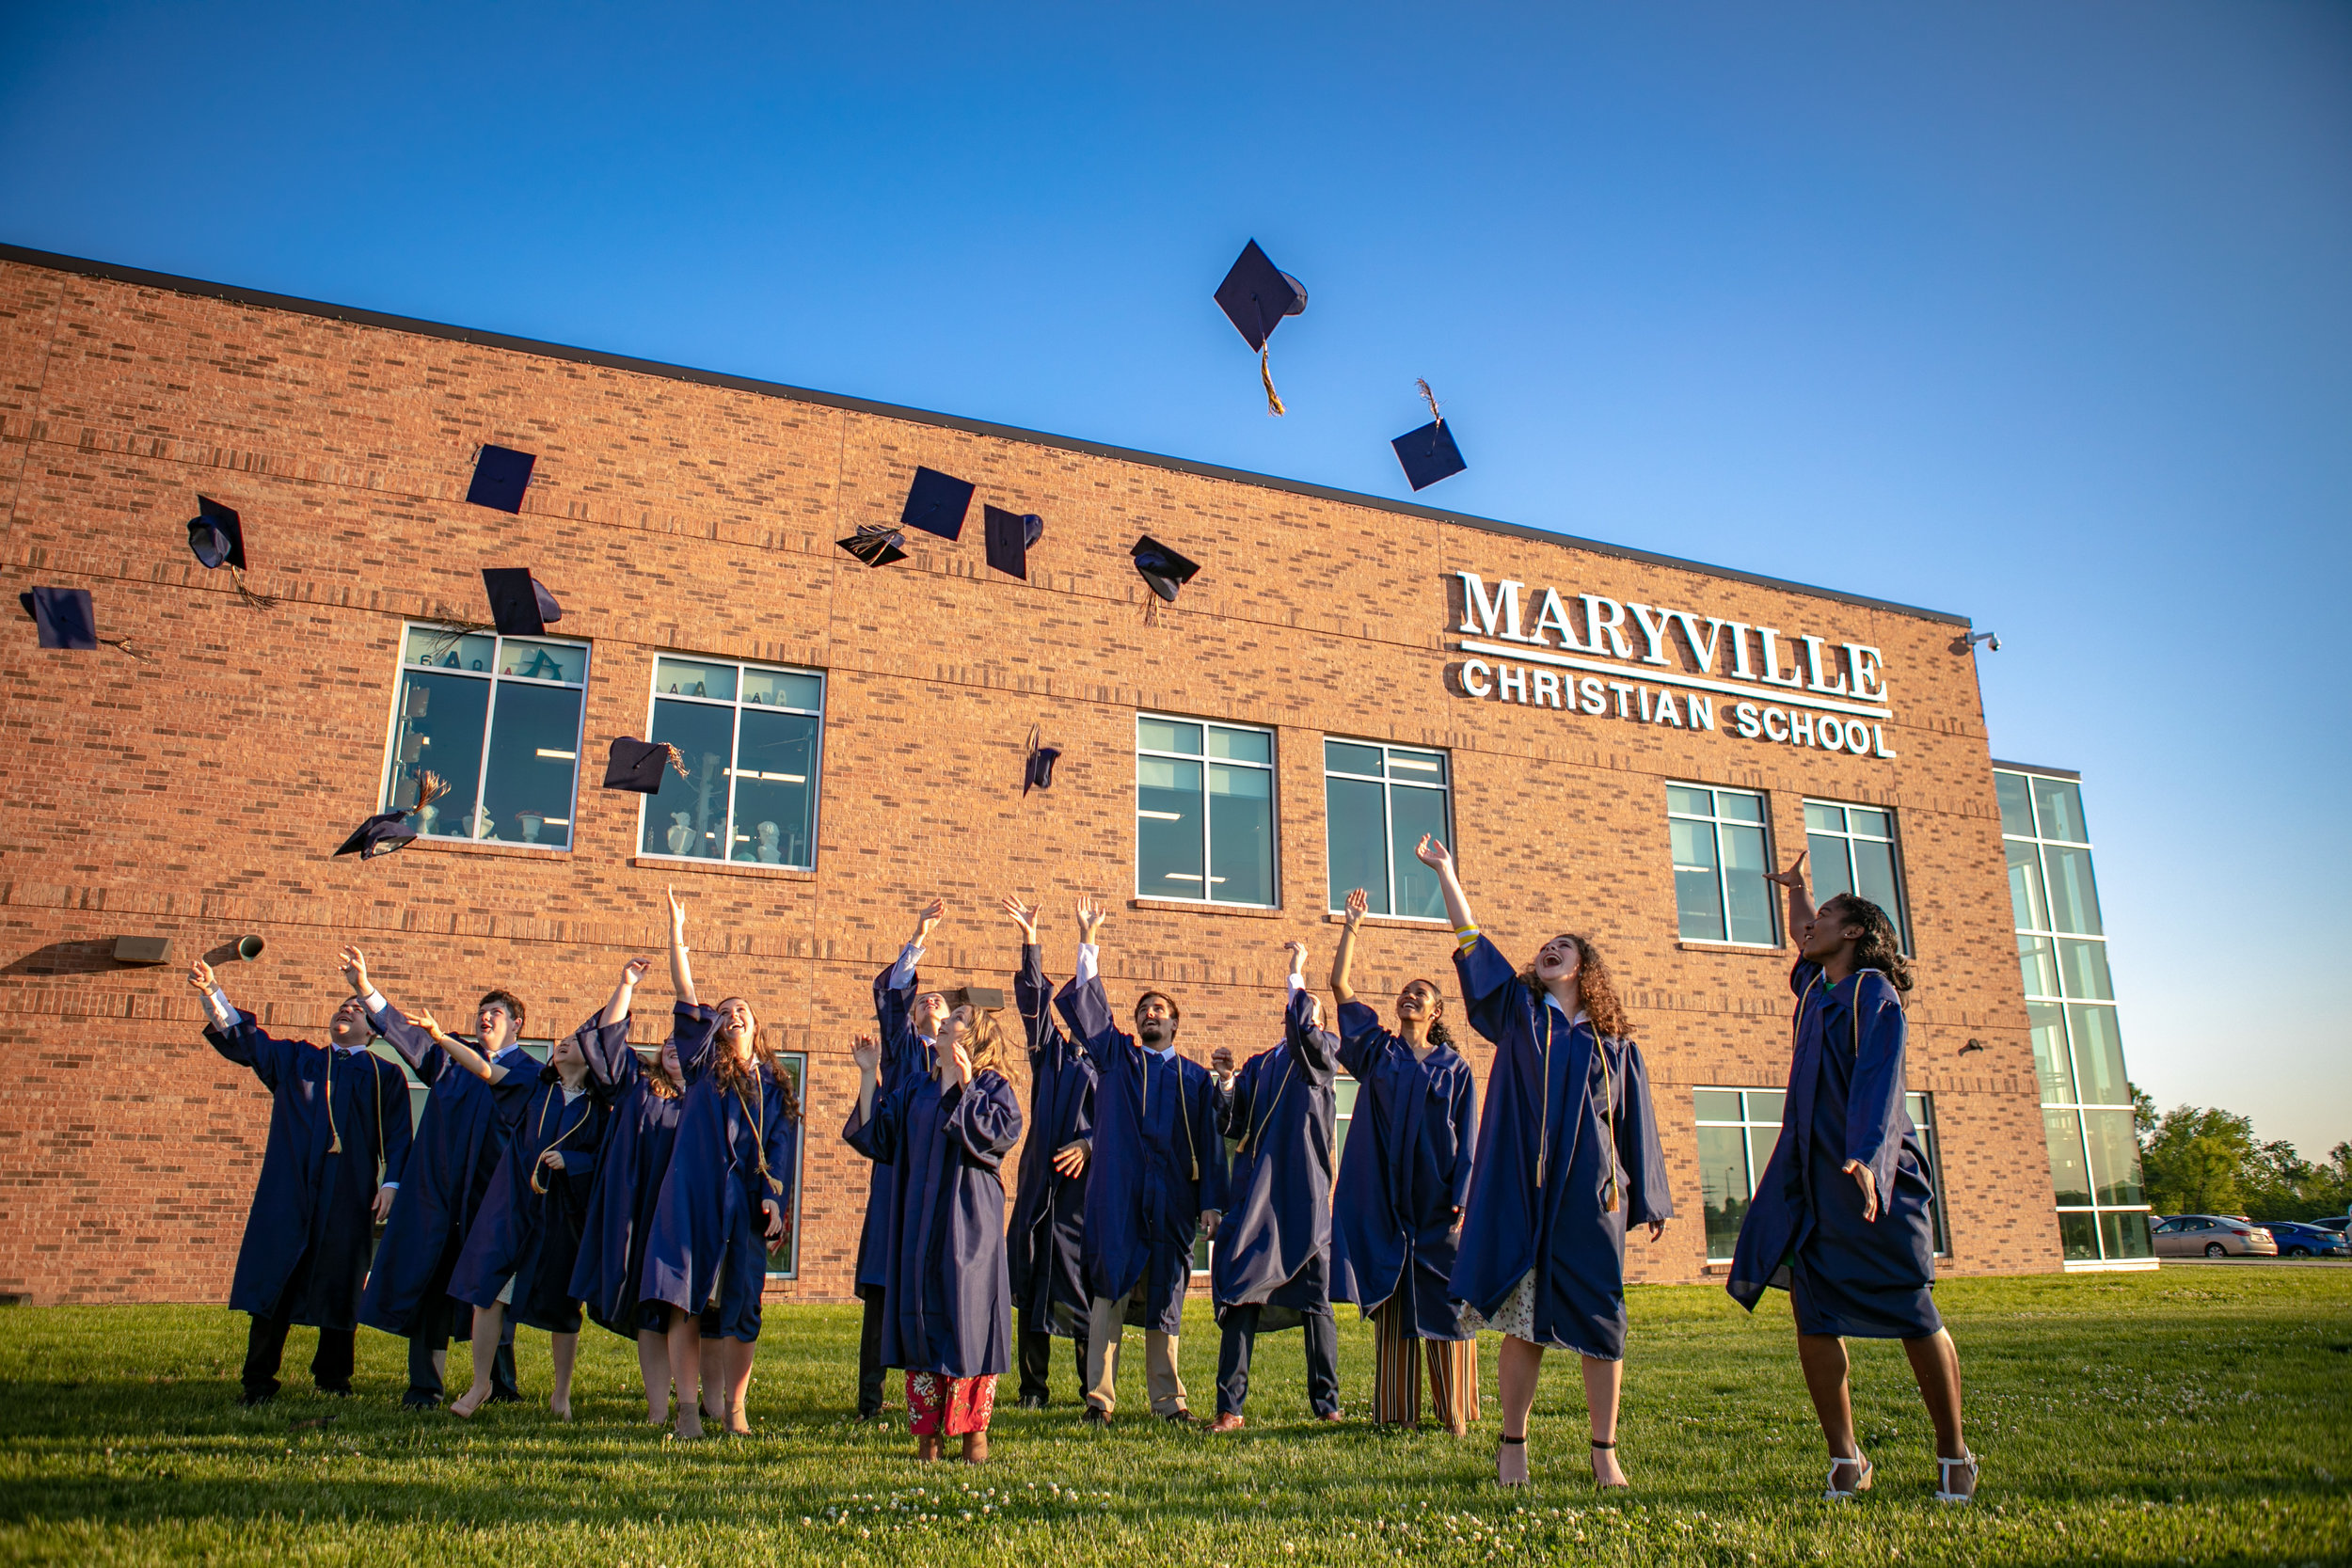 mchs_graduation_201916.JPG